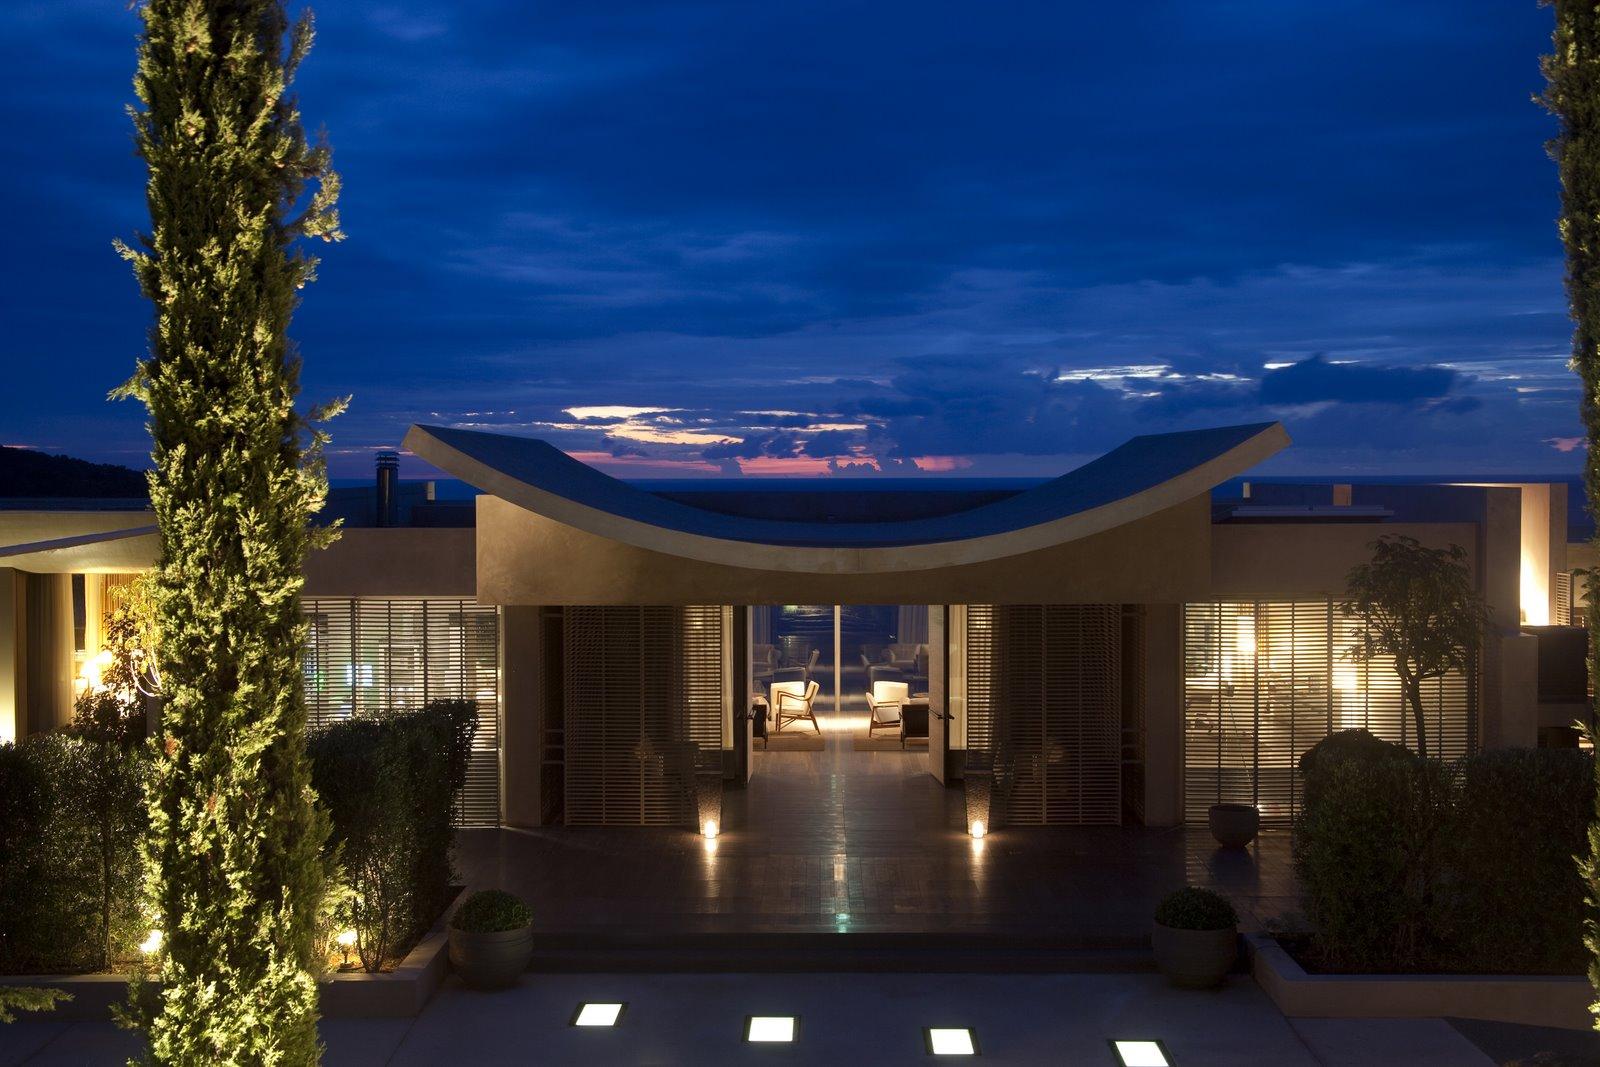 la r serve ramatuelle cote d 39 azur france cool hotels. Black Bedroom Furniture Sets. Home Design Ideas